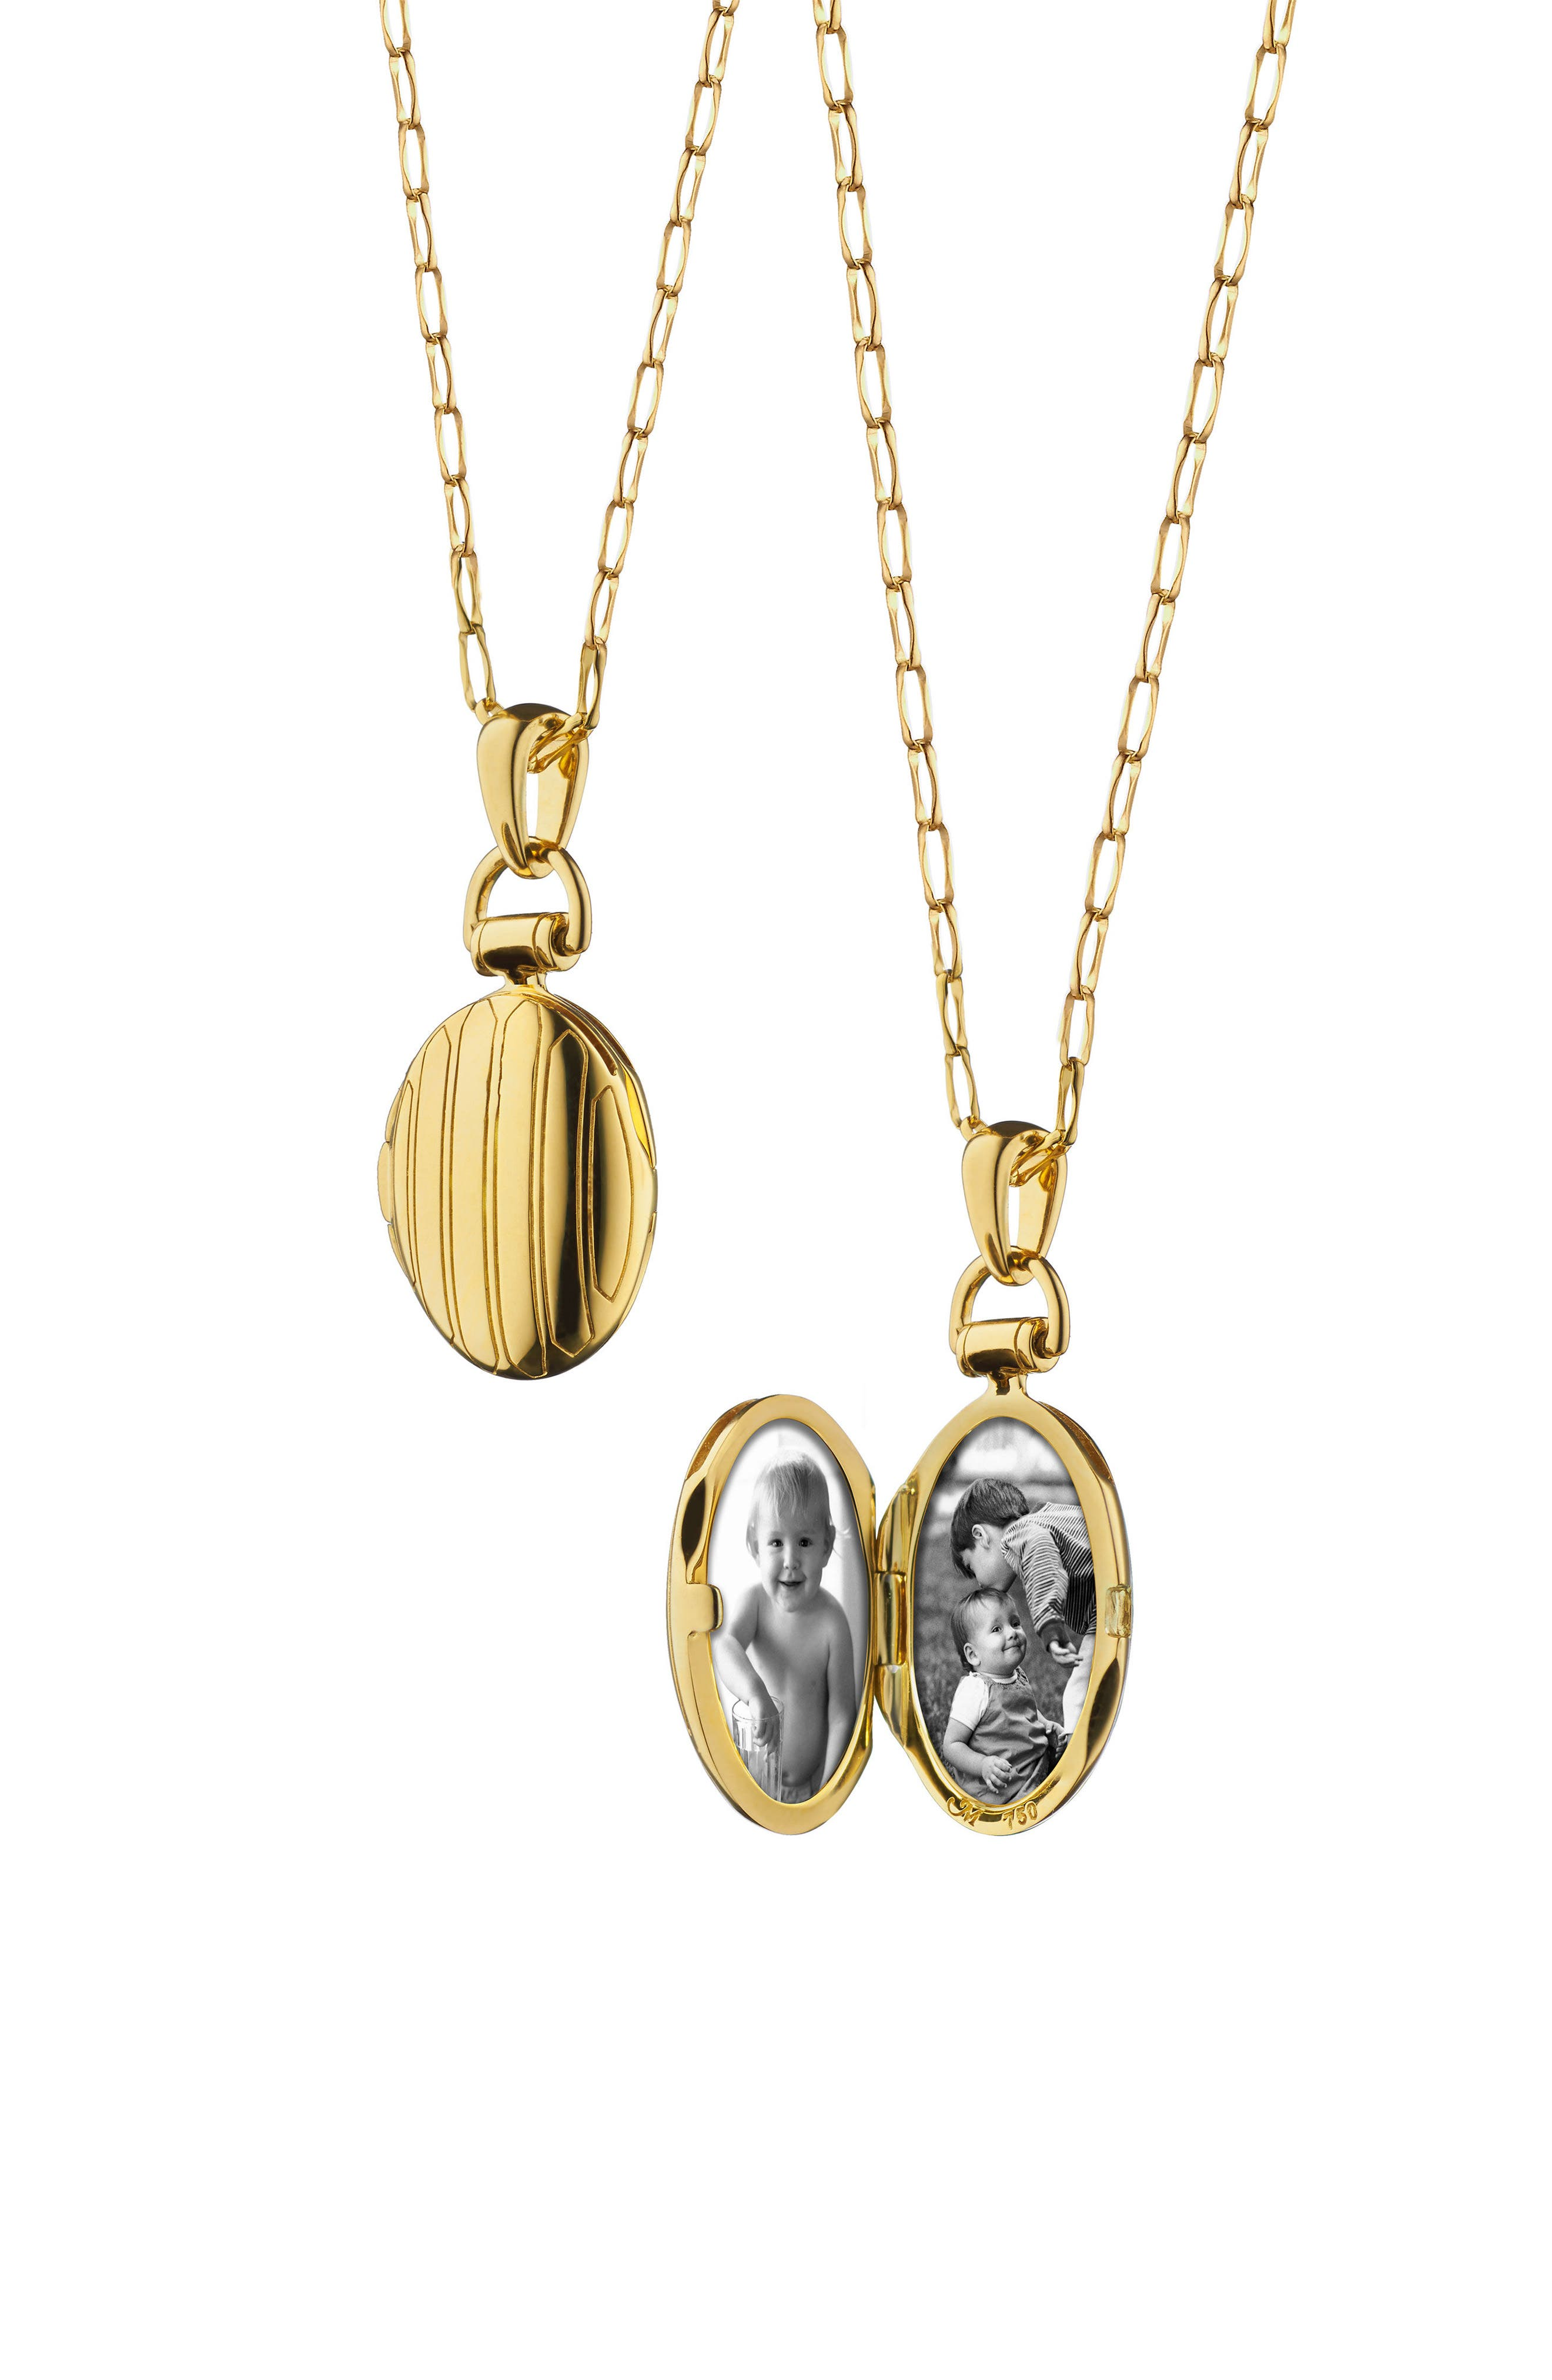 Pinstripe Petite Locket Necklace,                             Main thumbnail 1, color,                             18K YELLOW GOLD